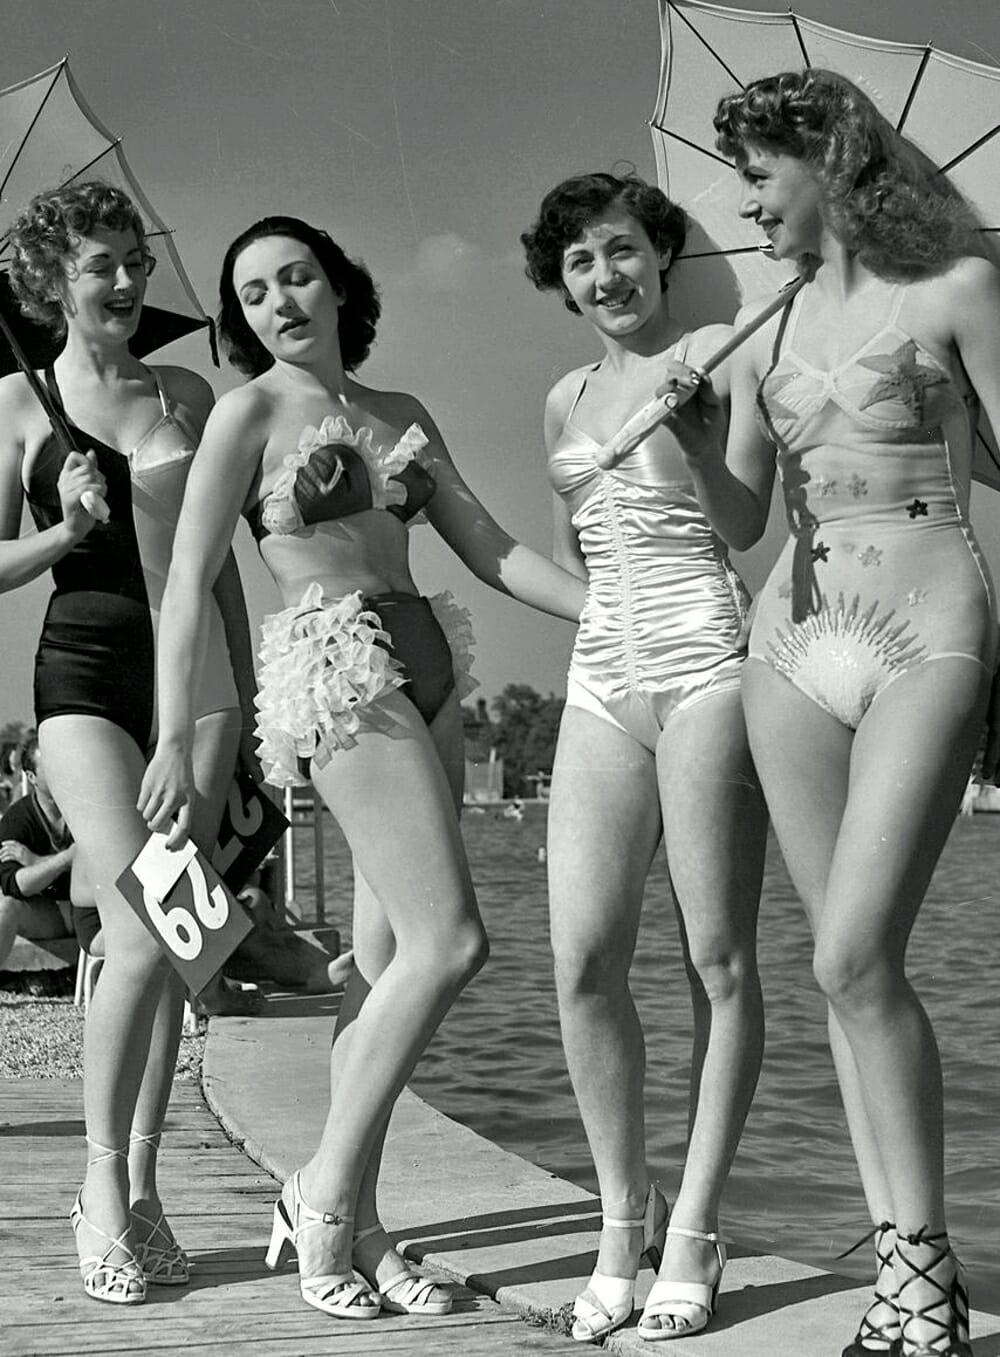 Evolution Of Swimwear - 1940s vintage style